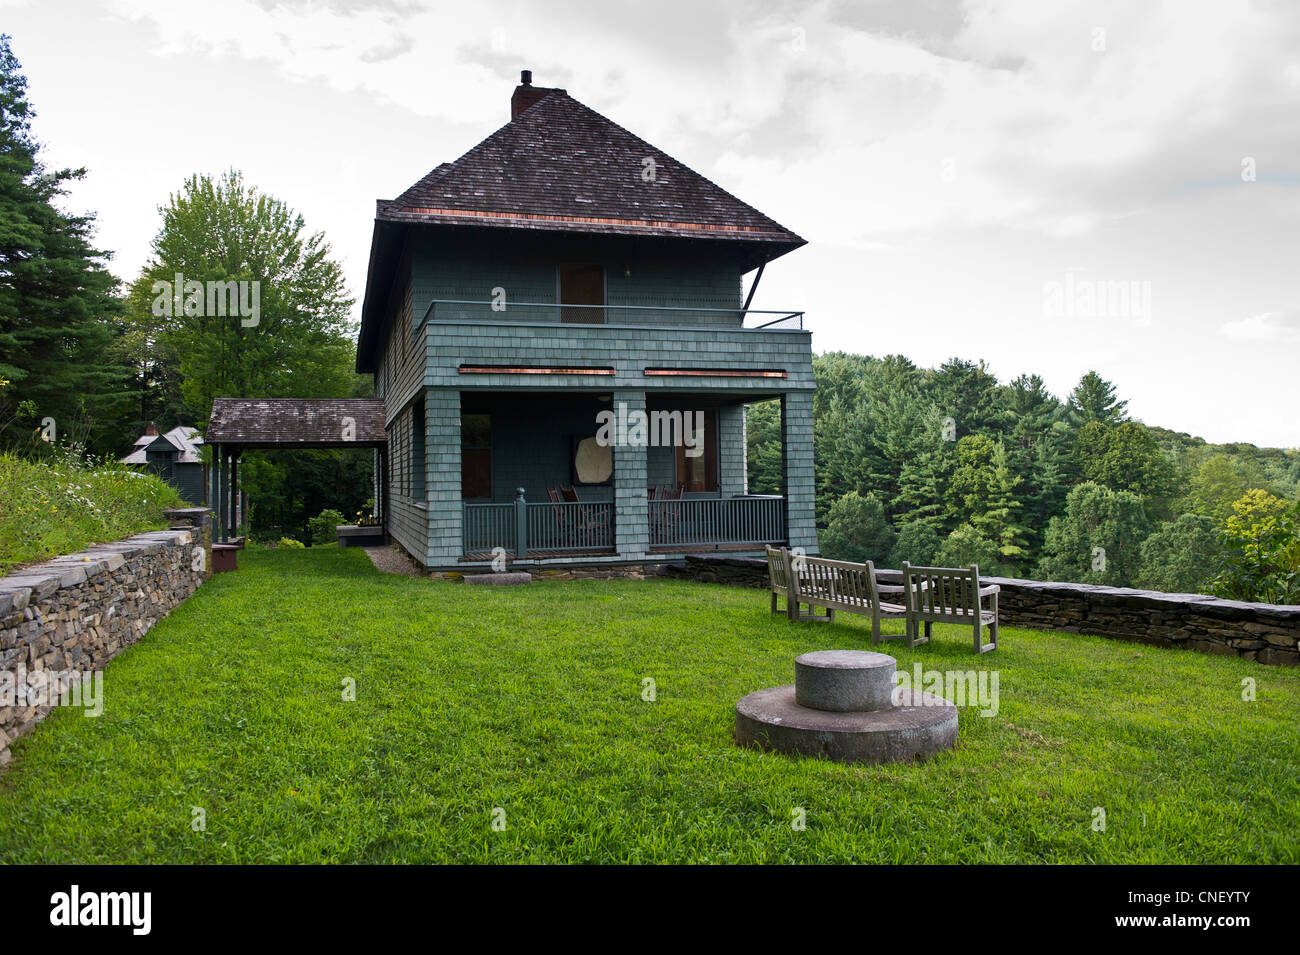 rudyard kipling stock photos rudyard kipling stock. Black Bedroom Furniture Sets. Home Design Ideas